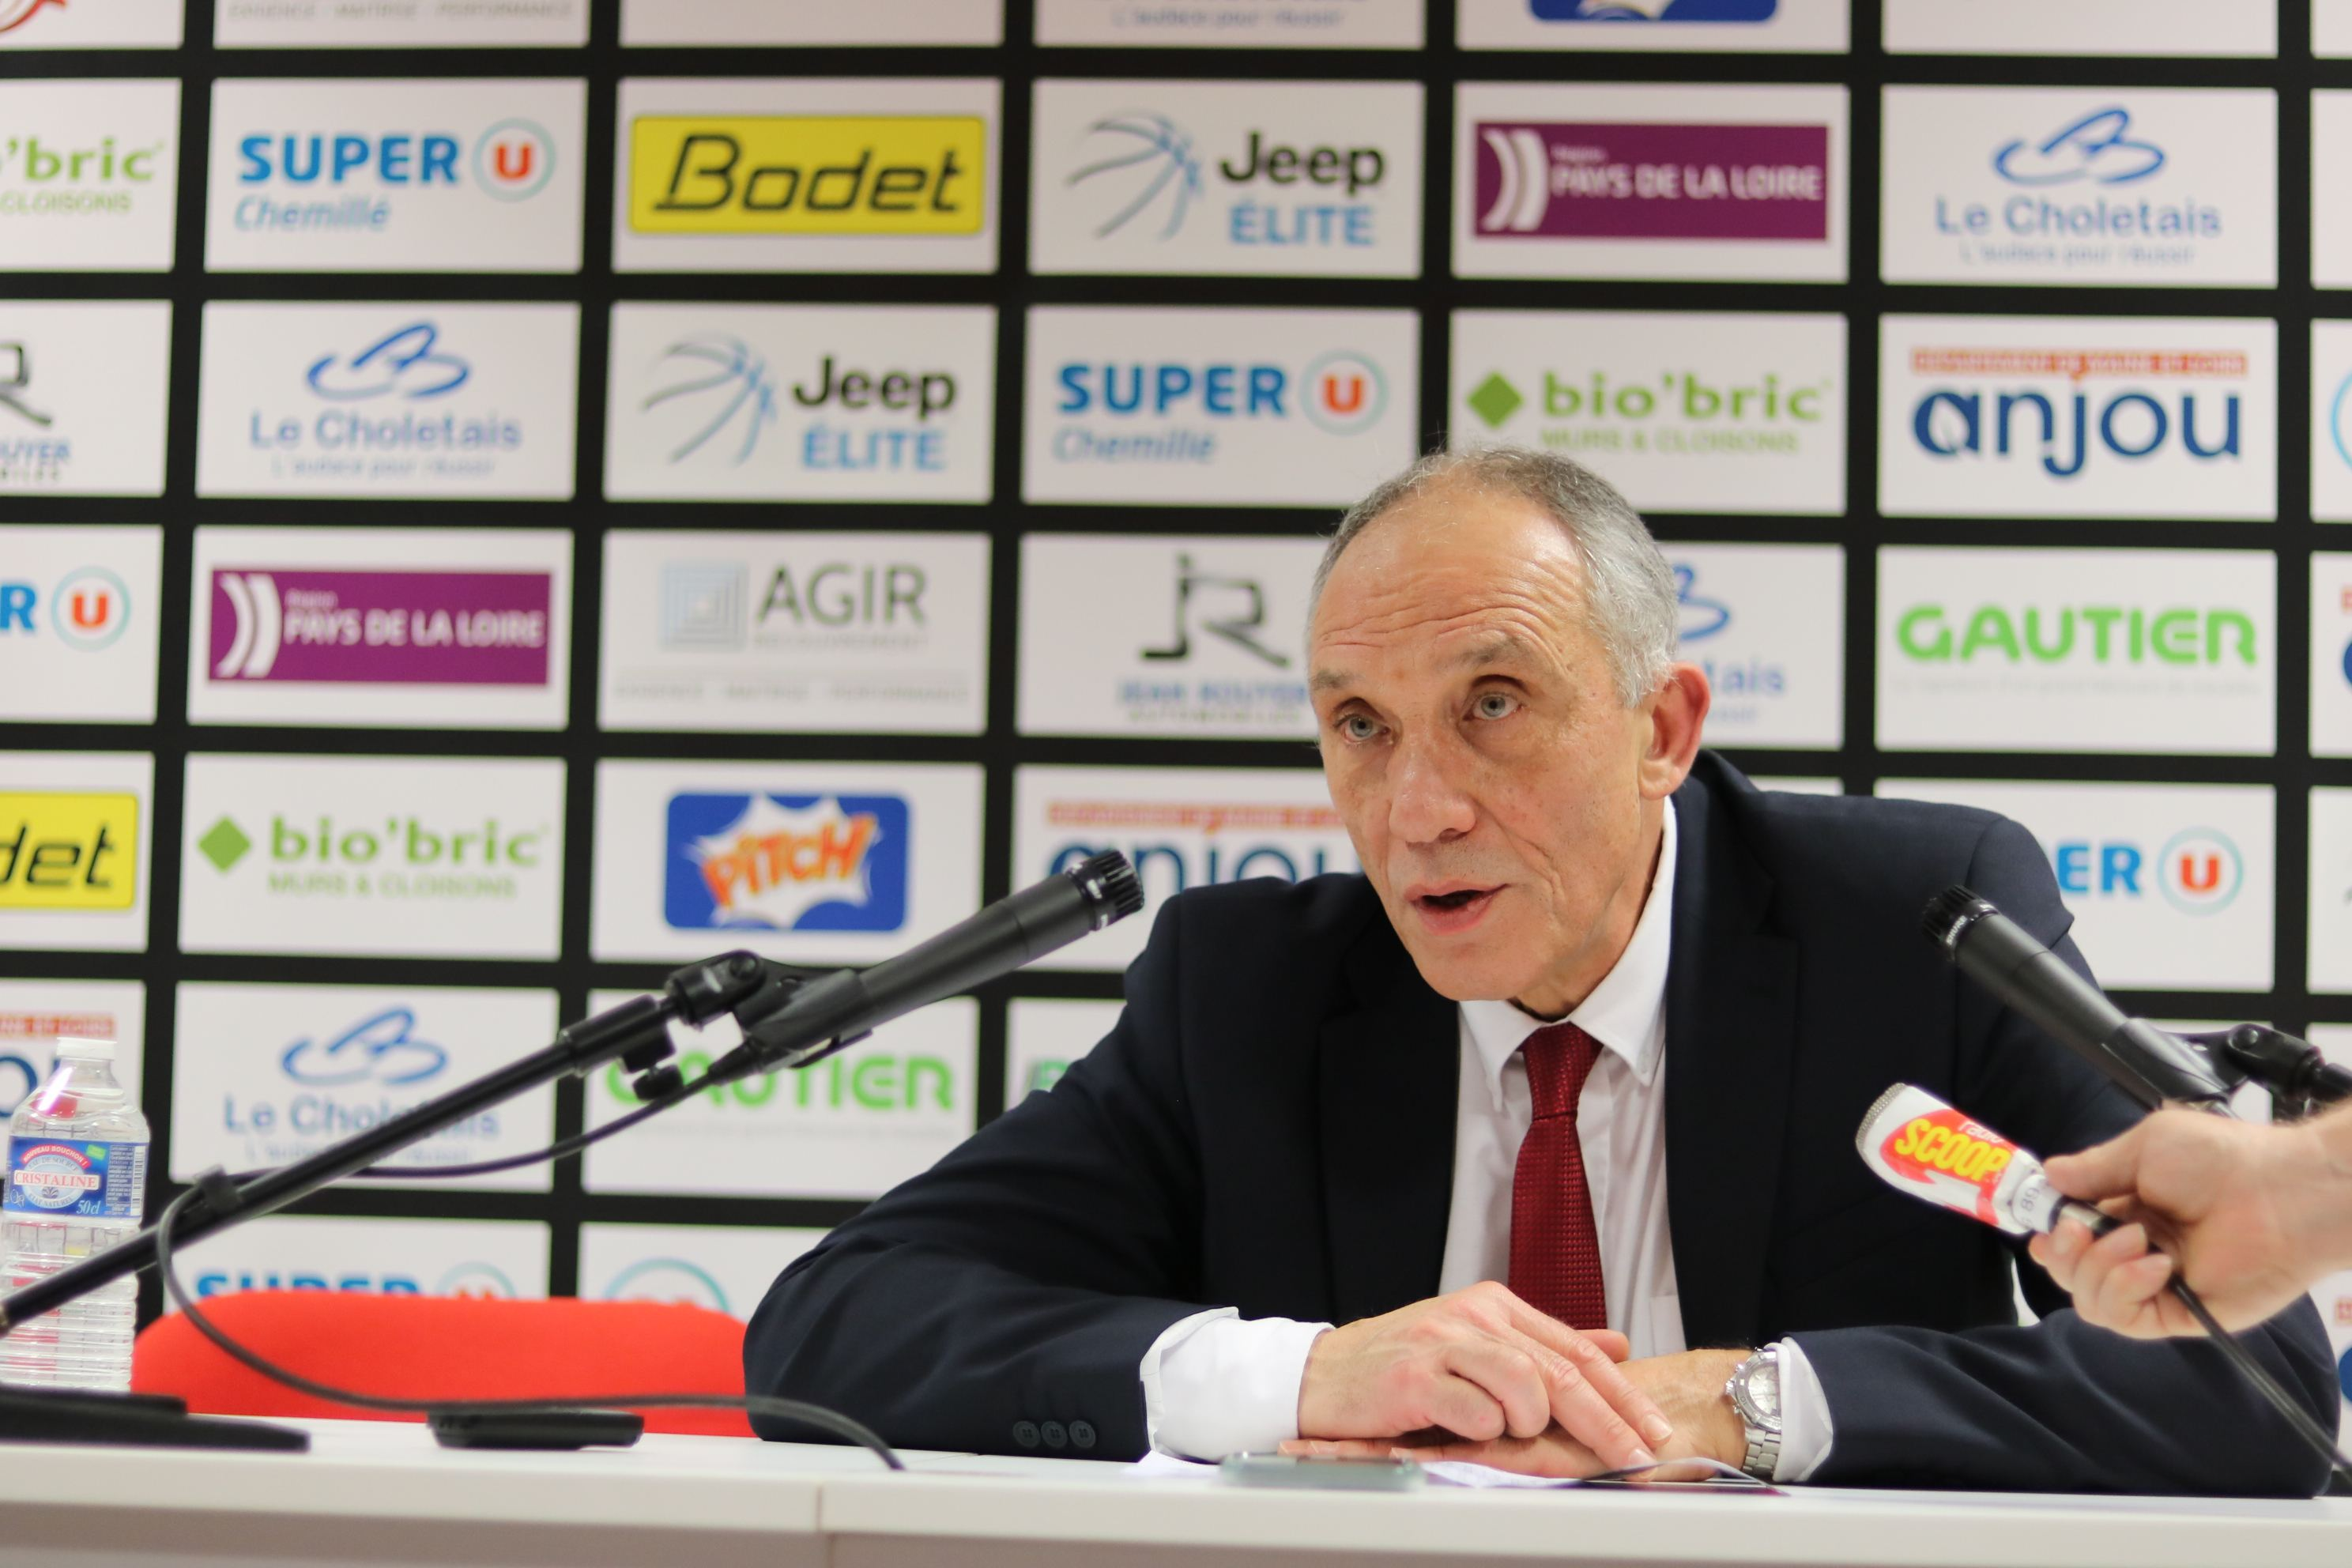 Conférence de presse KUNTER Erman - © Simon Godet